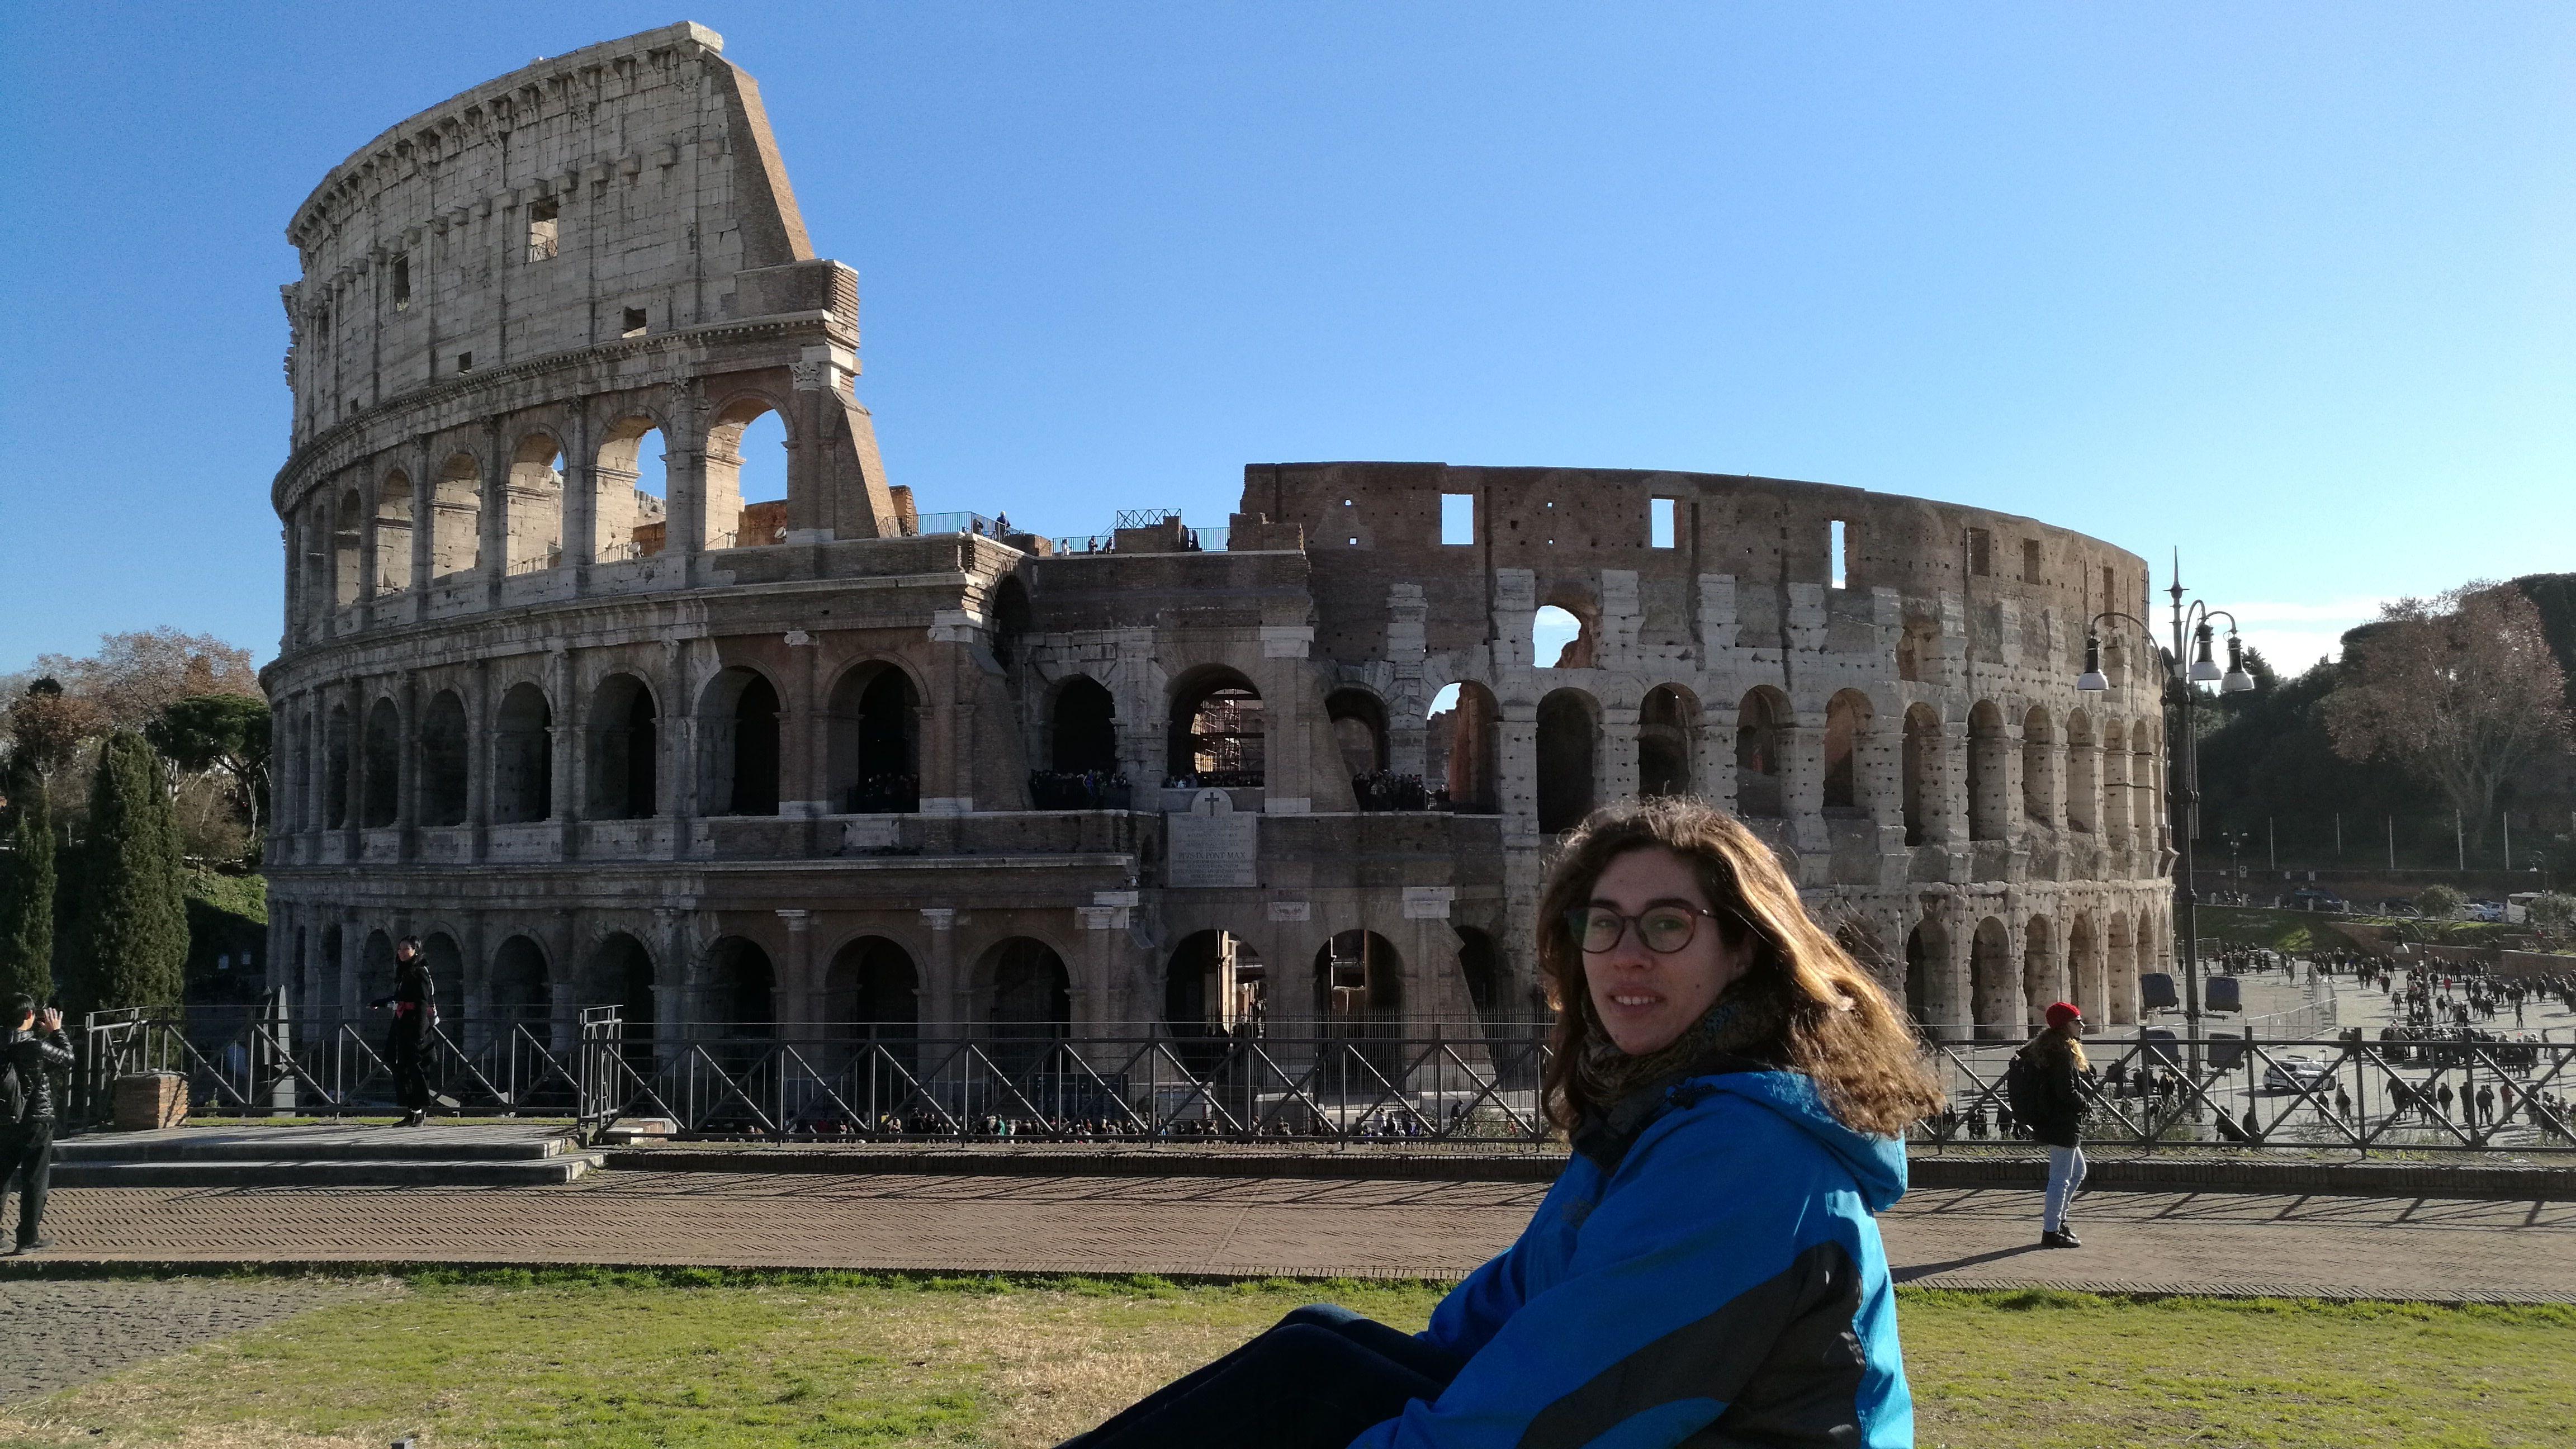 El famoso Coliseo